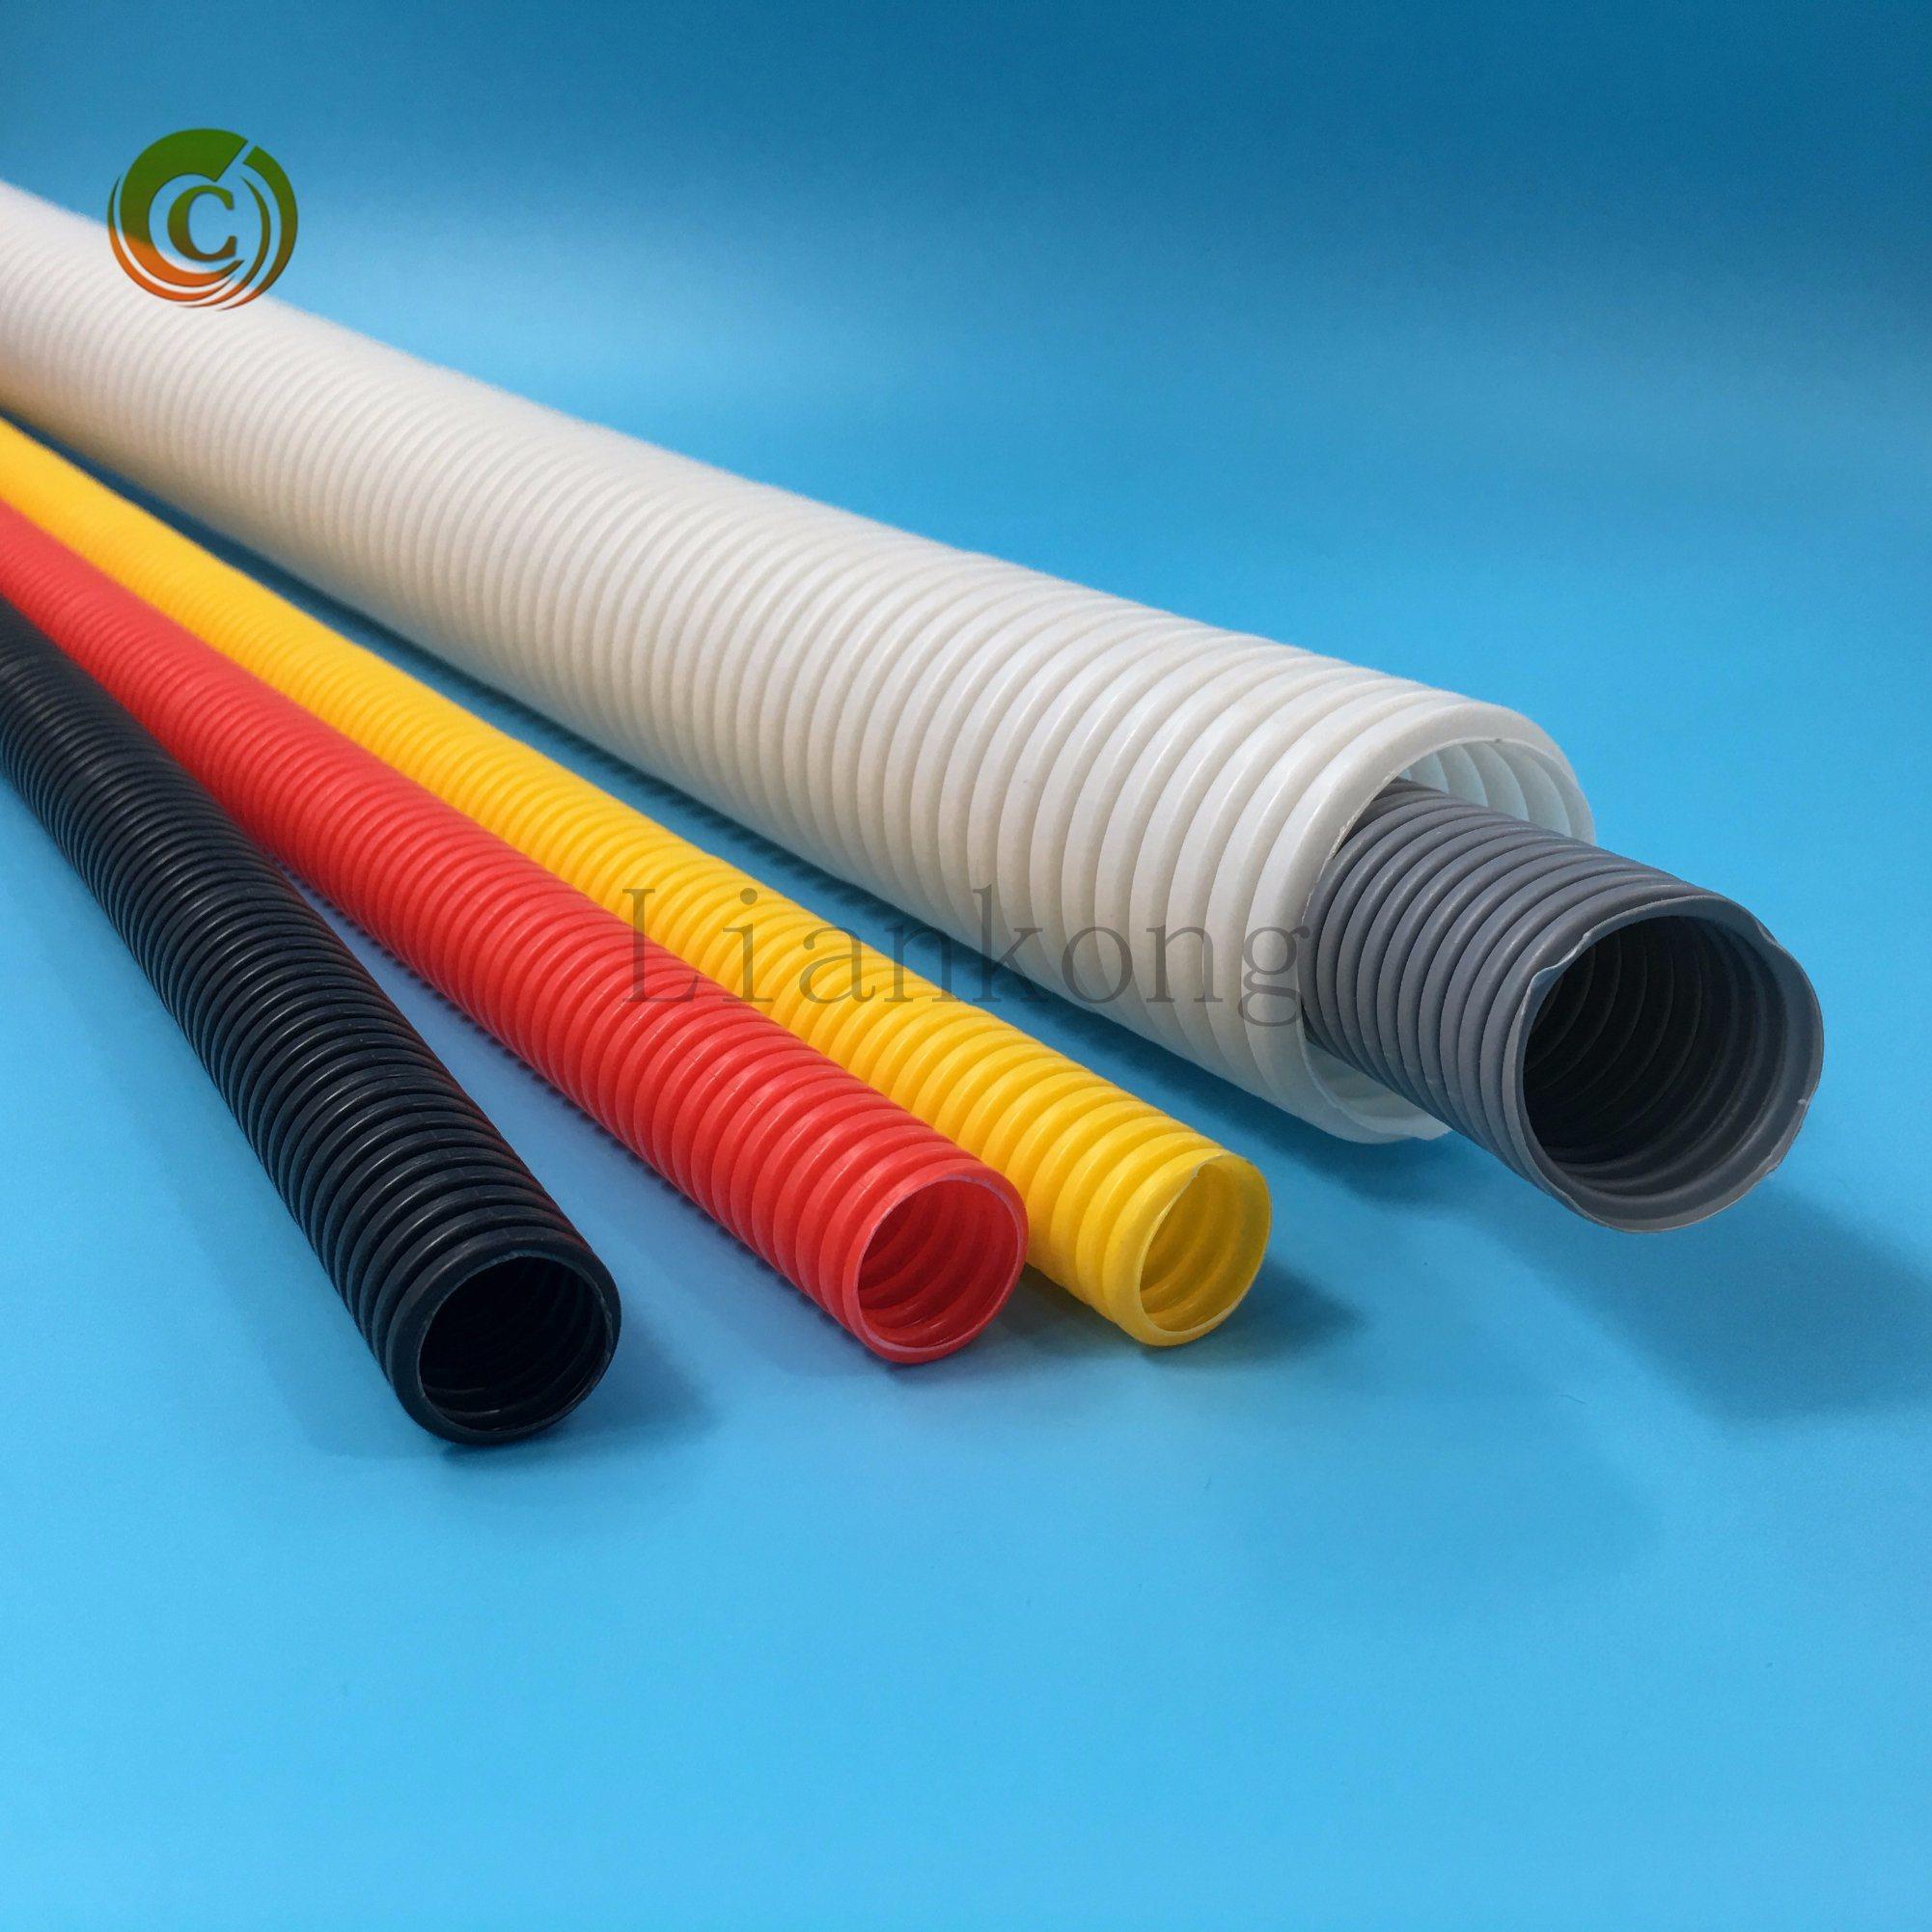 China Plastic Flexible Corrugated Pipe PVC Pipe - China PVC Pipe ...